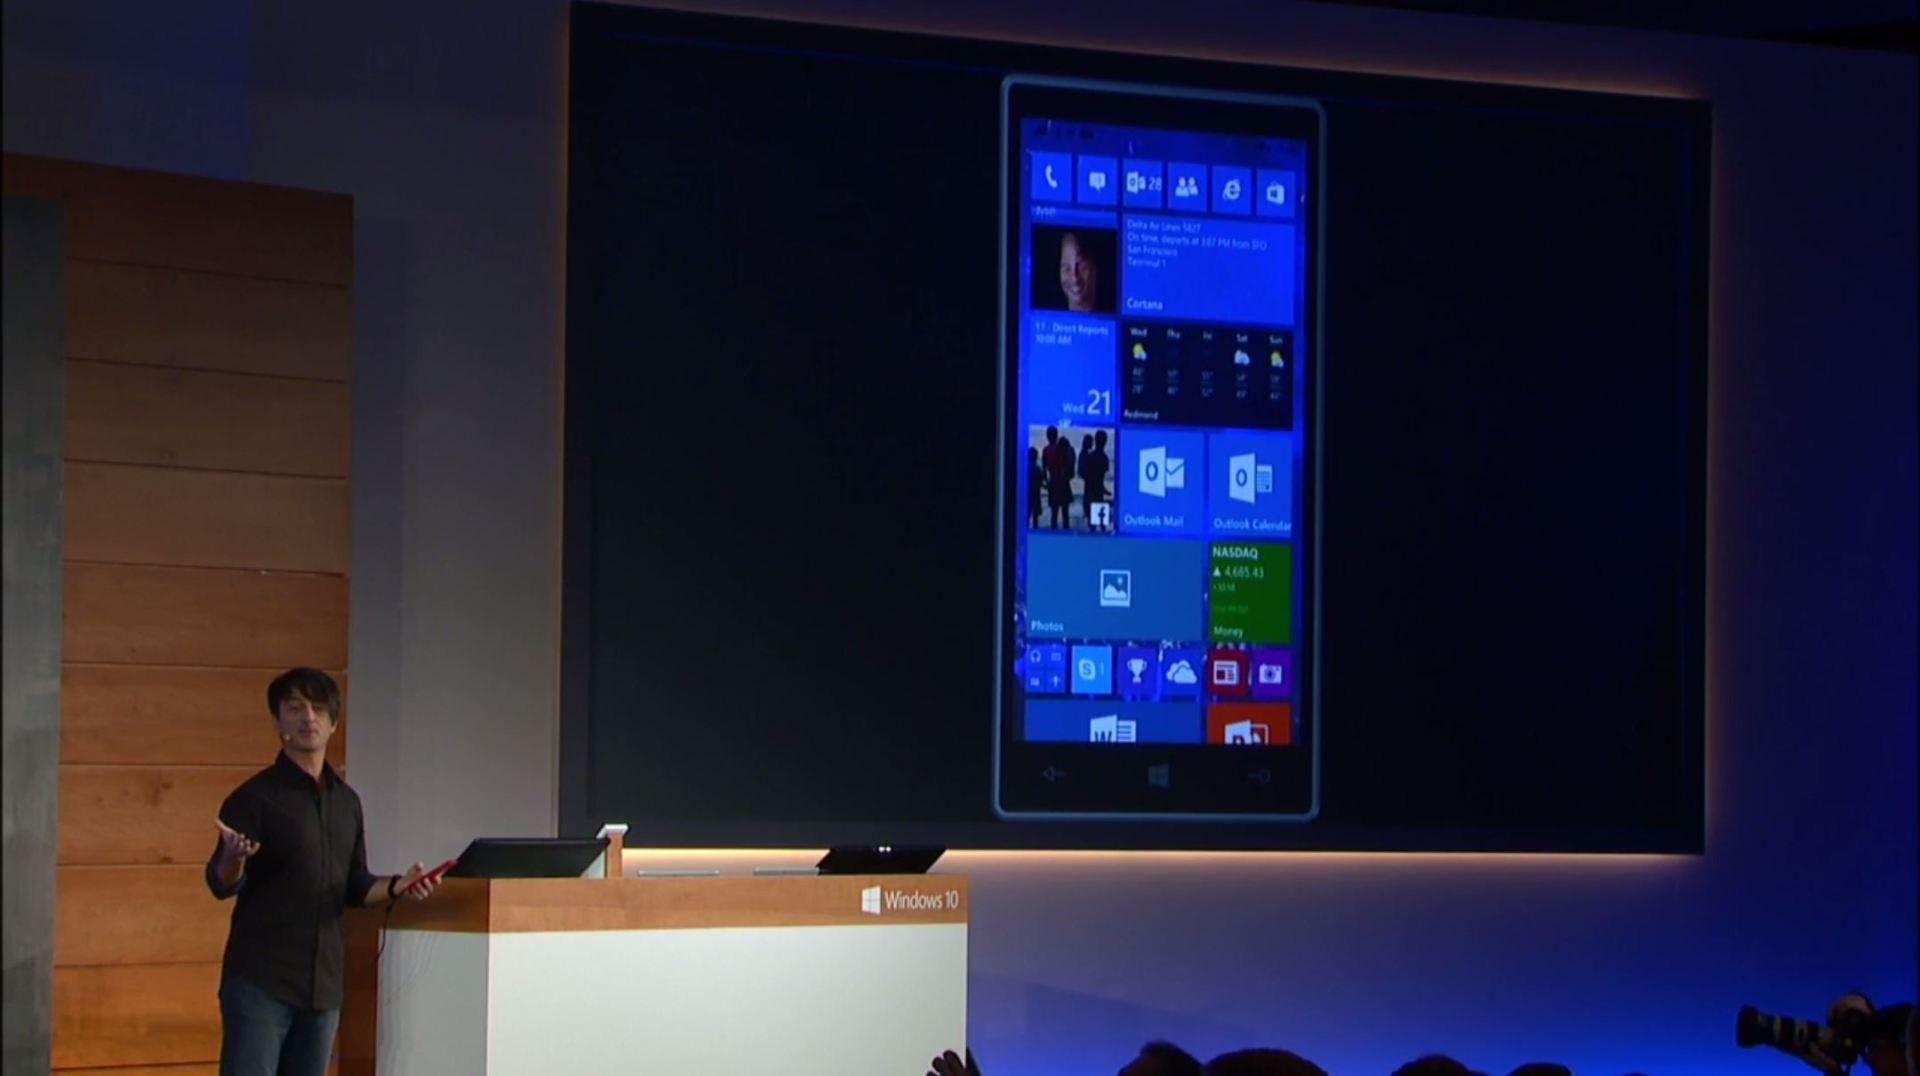 Windows 10: Octacore-Smartphones und -Tablets angekündigt